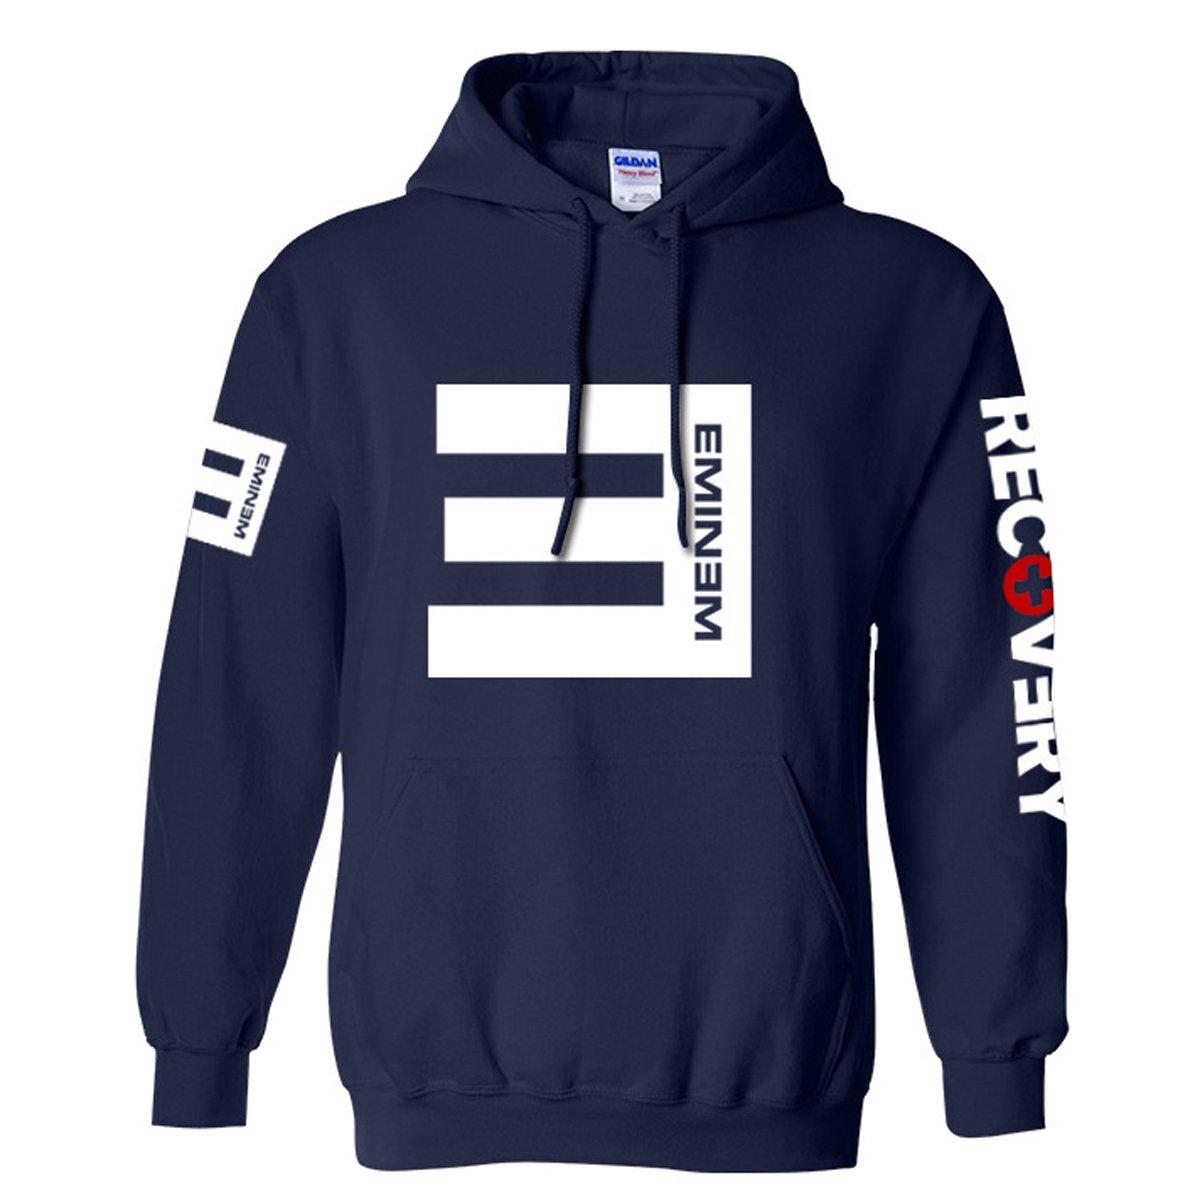 Navy XXLarge Nedal Unisex Hoodie Rap Jacket Fleece Hip Coat Adult Hop Sweatshirt Front Pocket